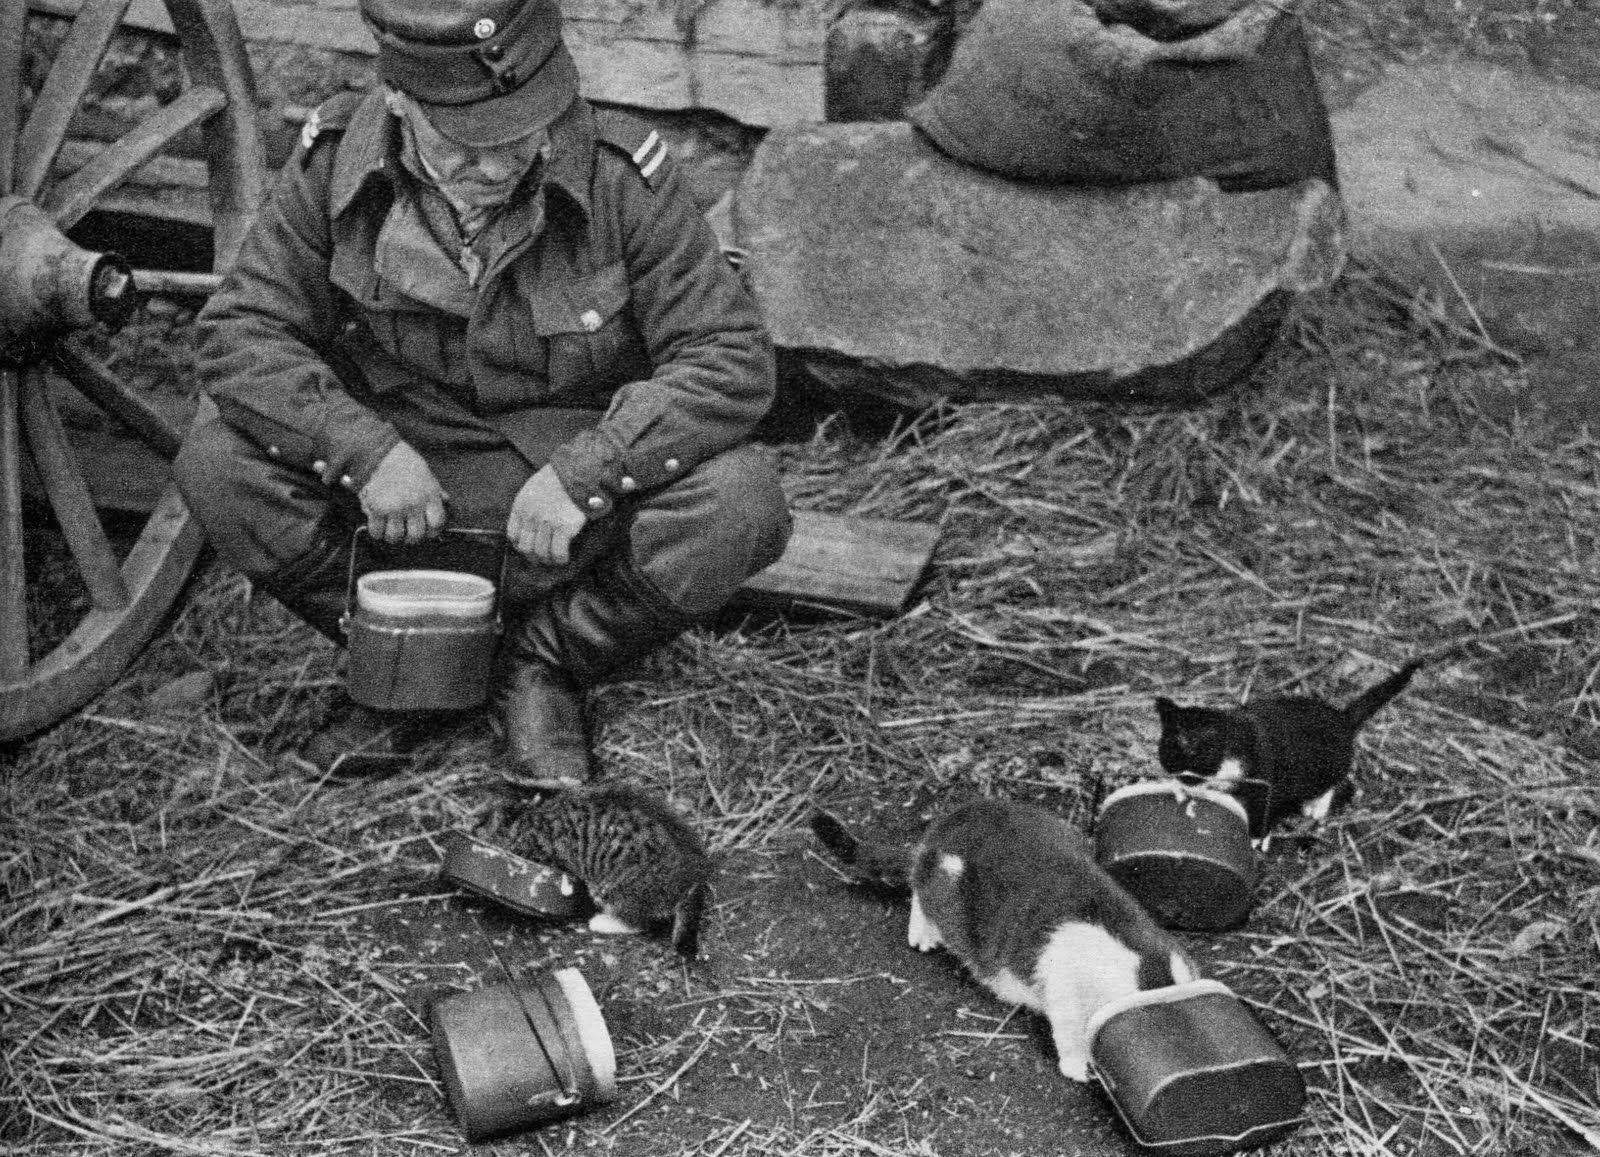 Finnish Soldier Feeding Kittens  WWII  [1600x1157